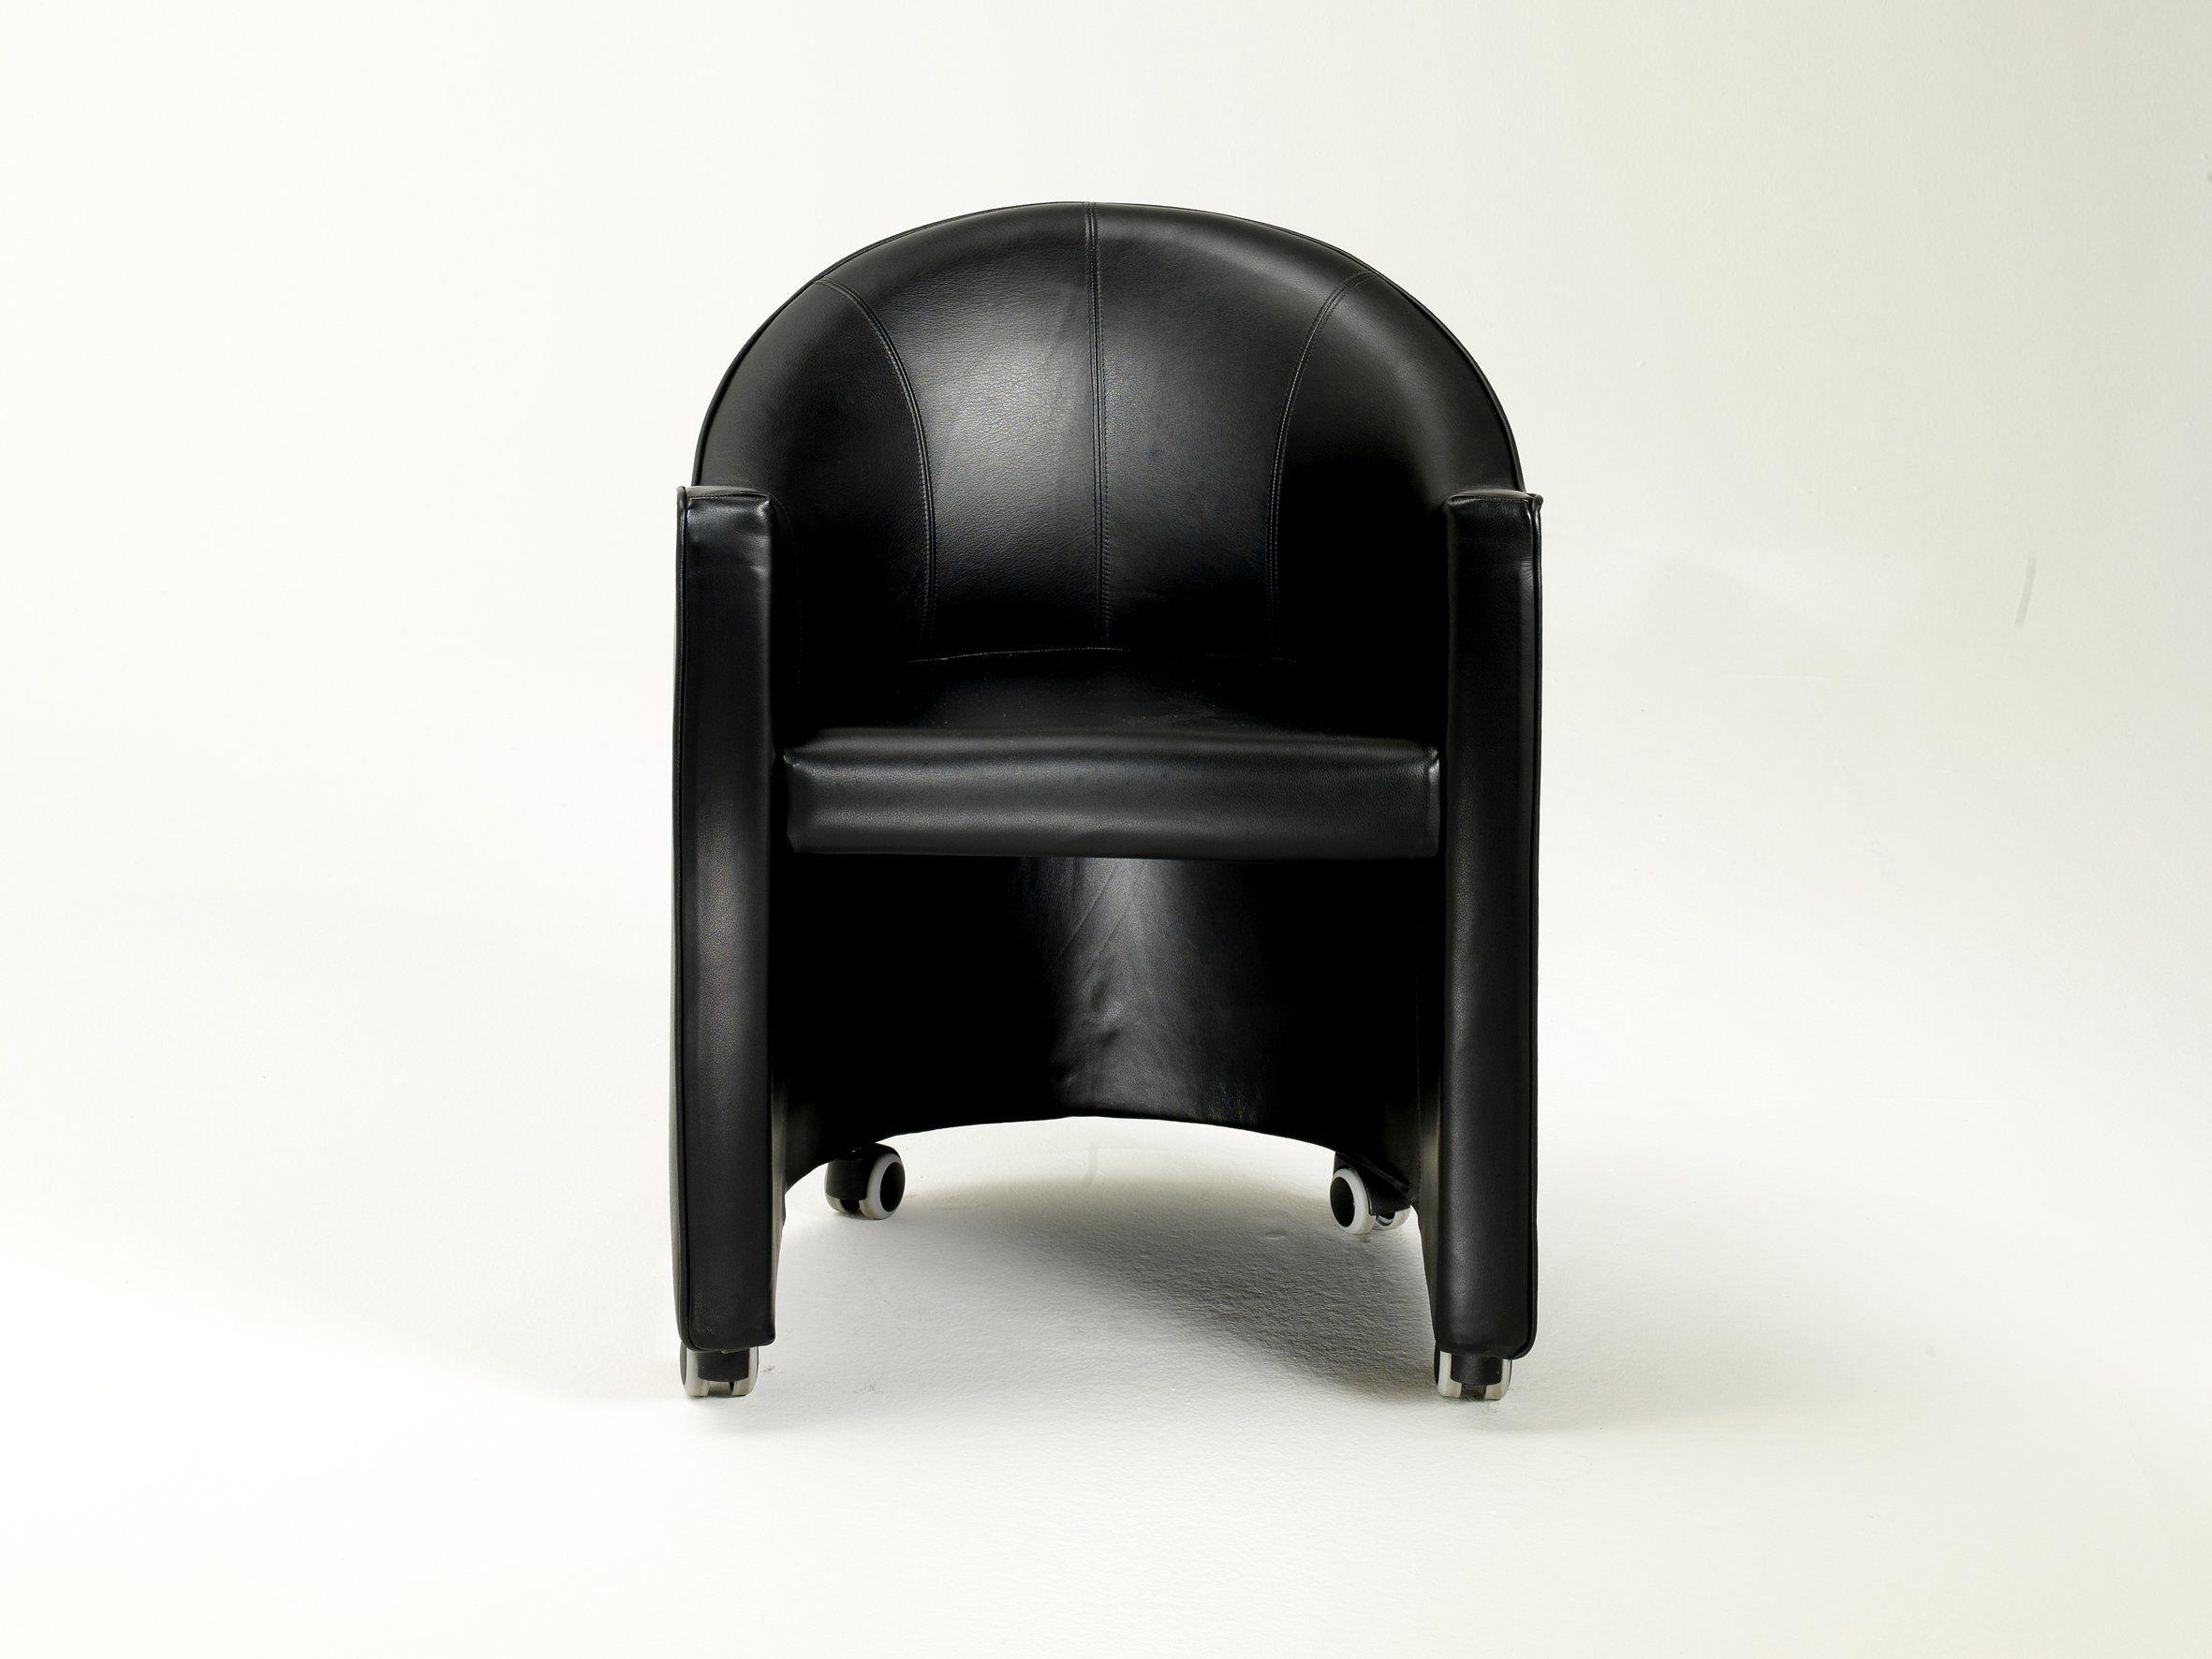 Palmito petit fauteuil by i 4 mariani design ammannati vitelli - Petit fauteuil en cuir ...